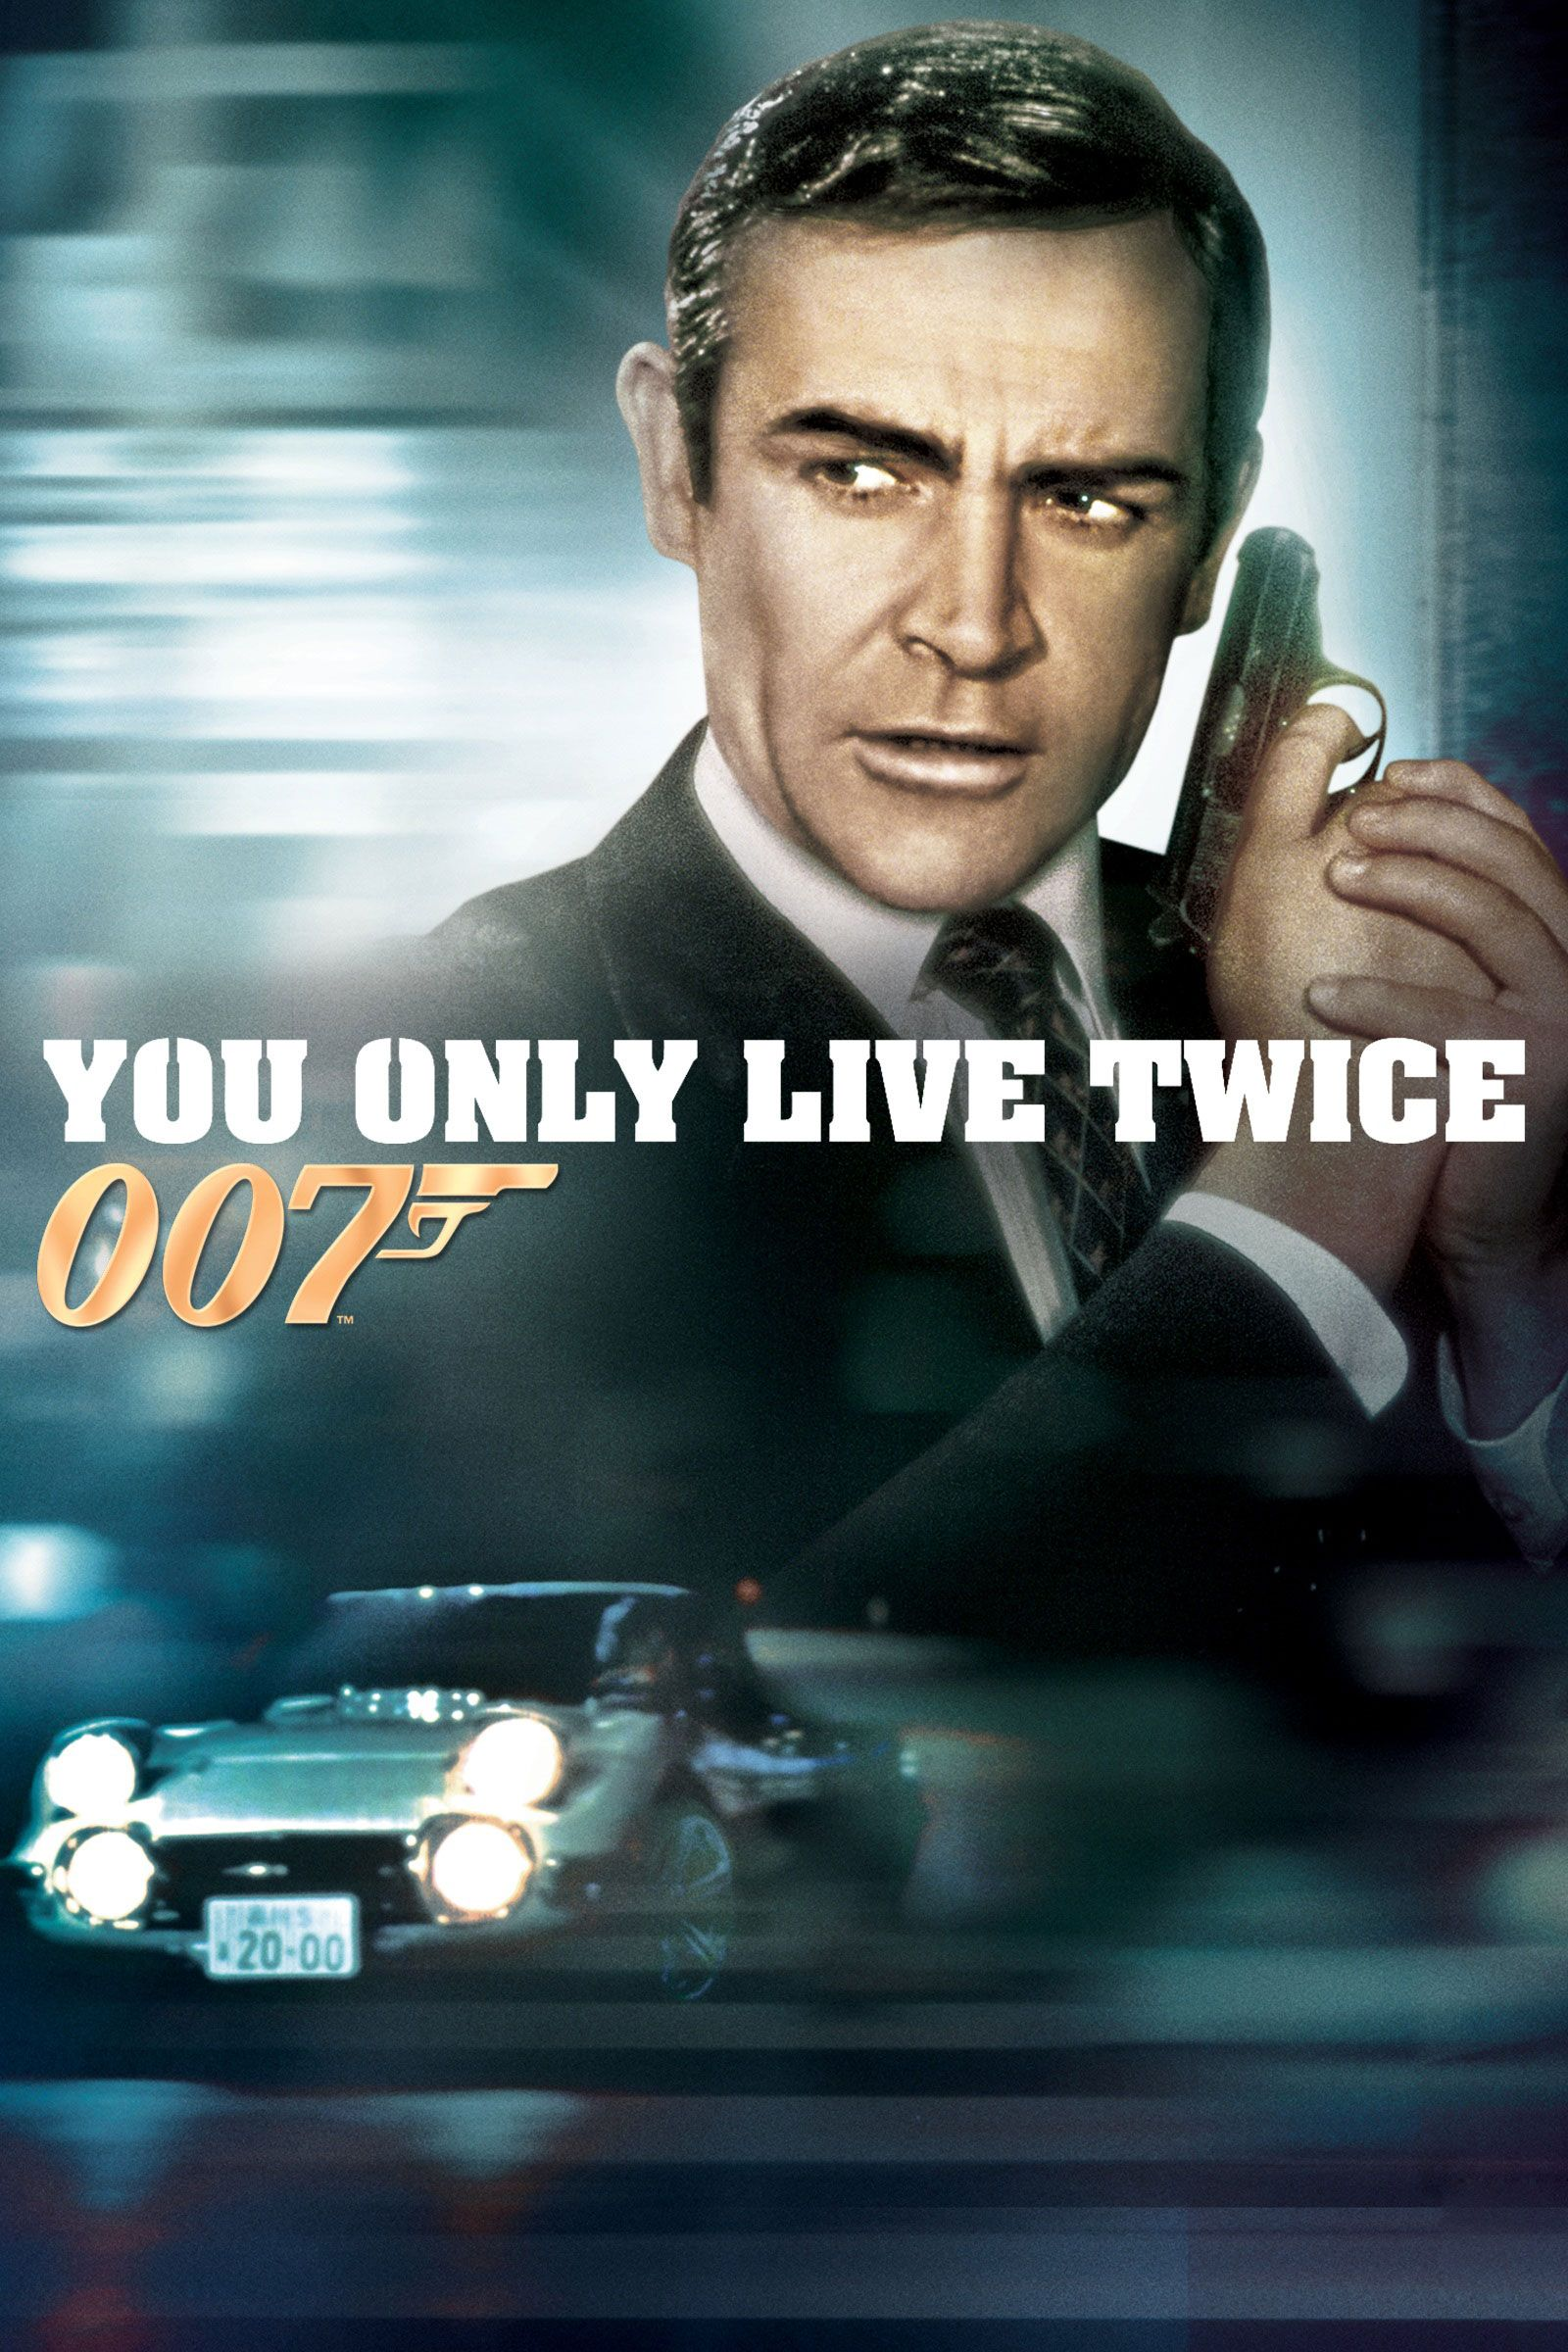 You Only Live Twice Jpg 1 600 2 400 Pixels Twice Agente 007 Filmes